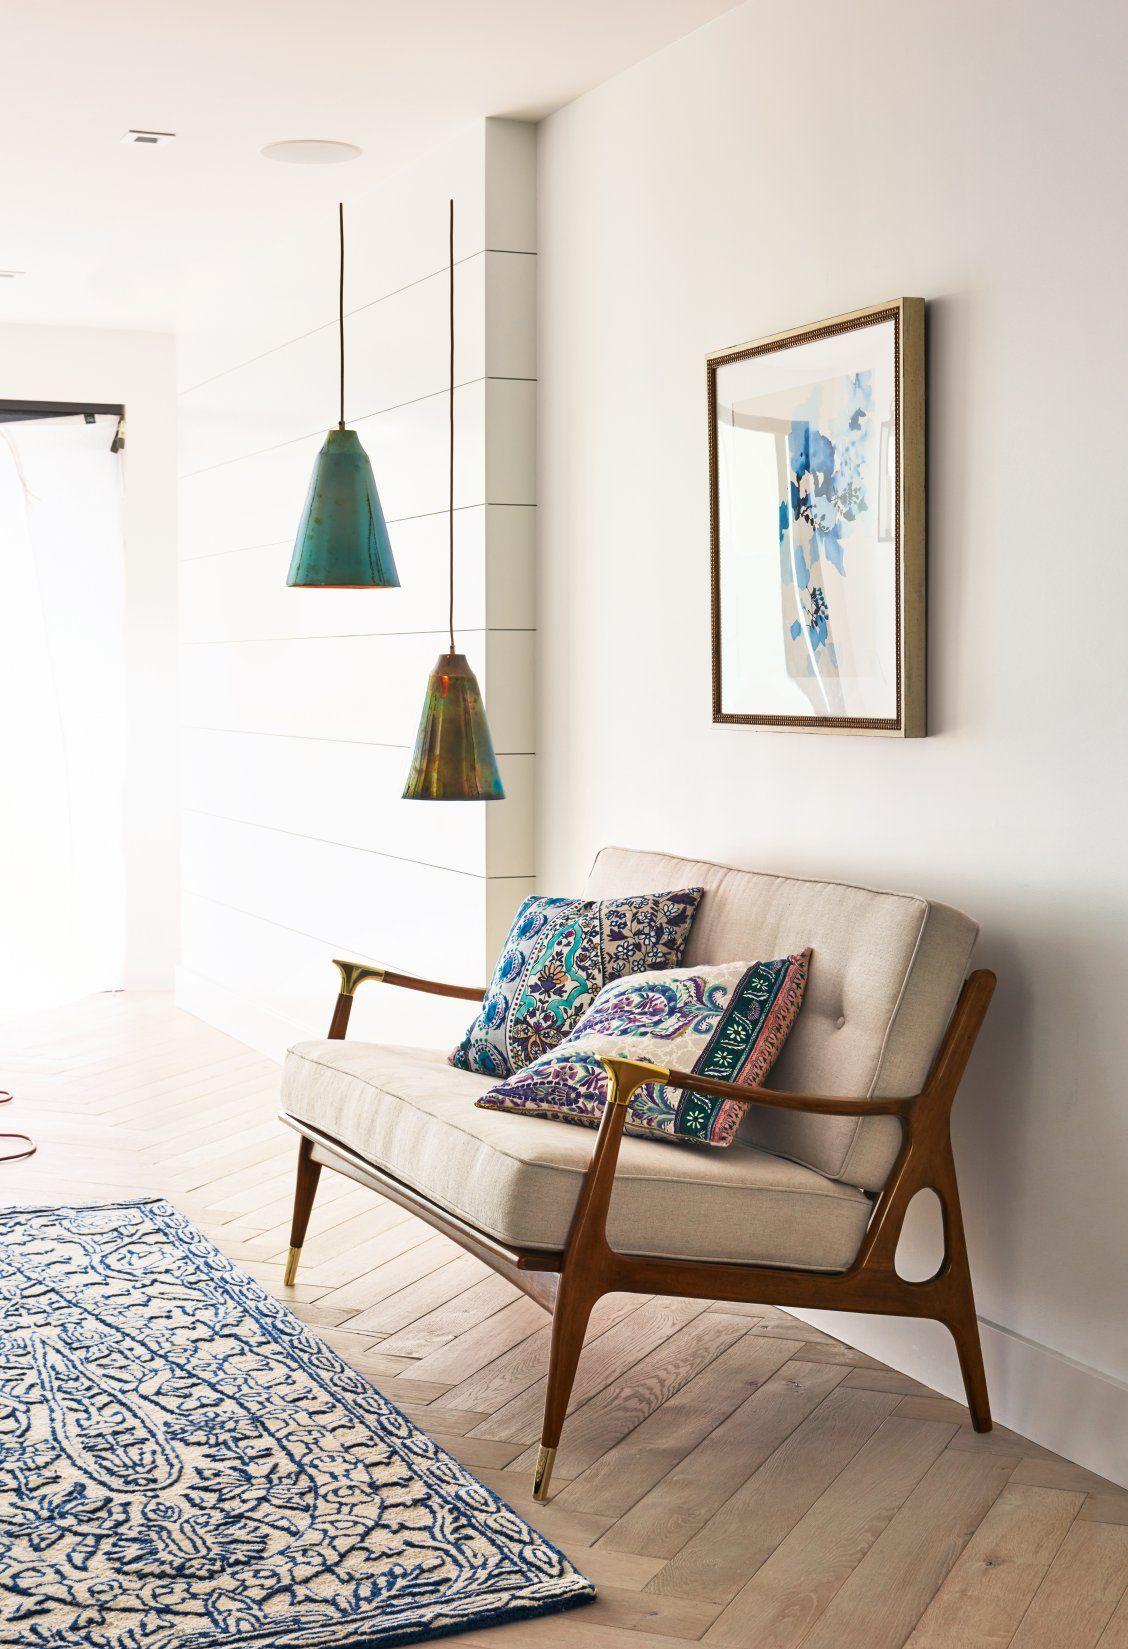 Anthropologie Home Decor Ideas Part - 32: Home Decor Home Decor Ideas Home Decor Living Room Home Decor On A Budget